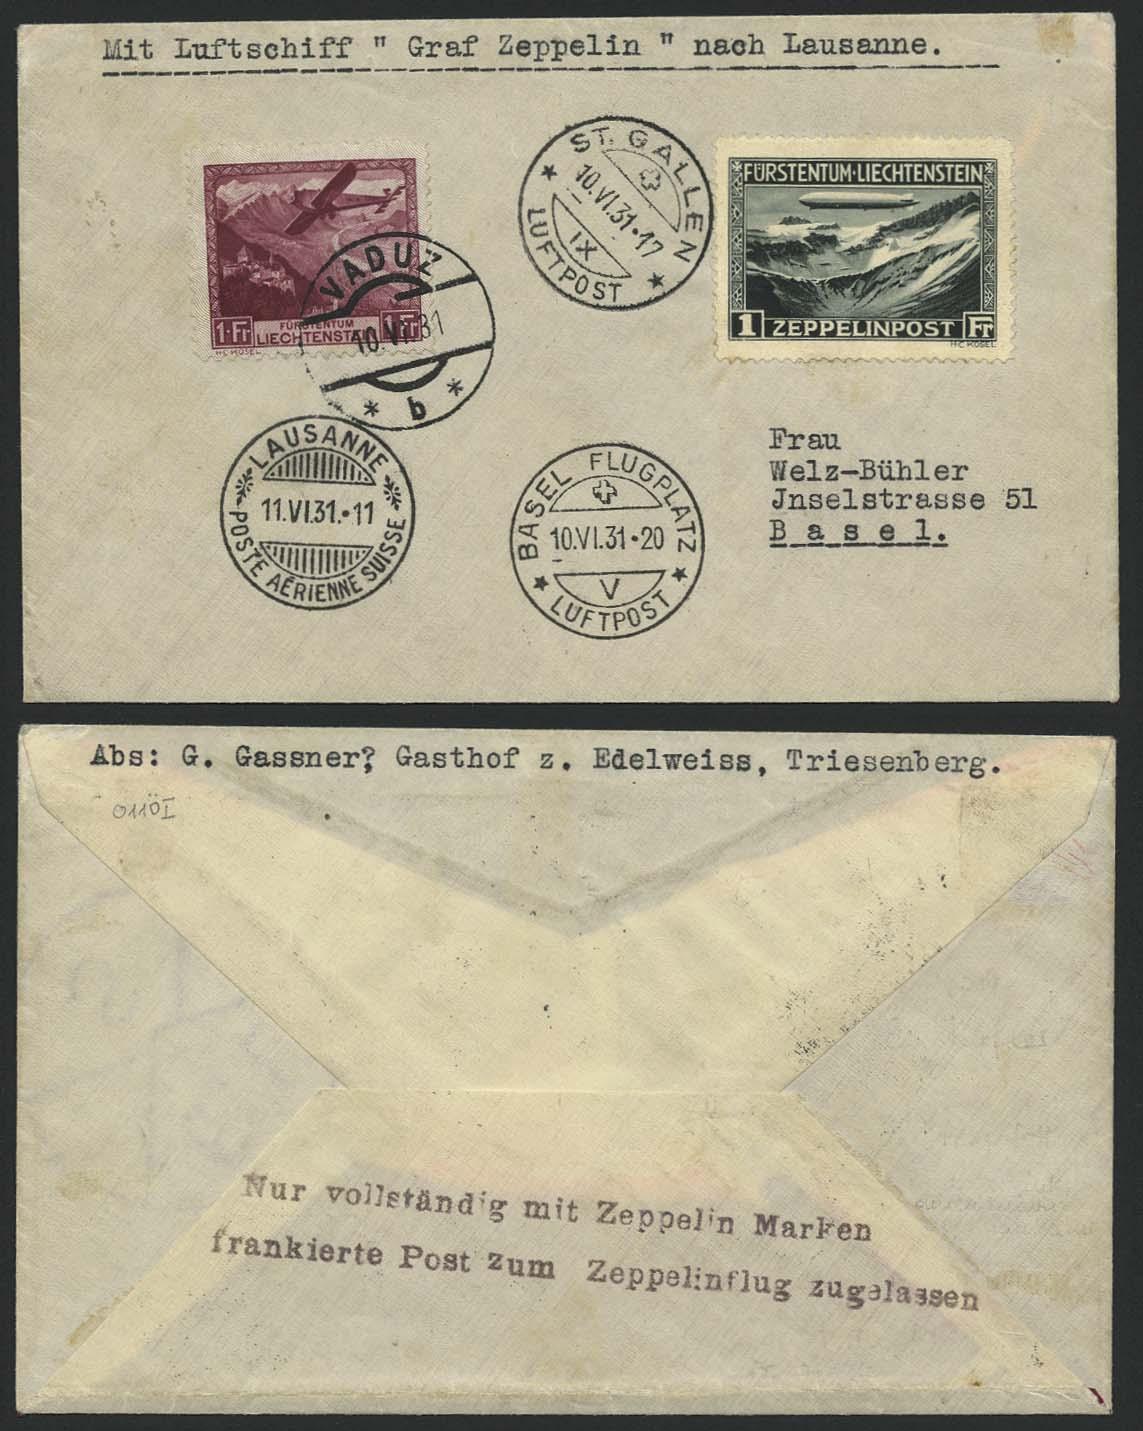 Lot 4258 - zeppelinpost nach sieger LZ 127 - 1931 -  Auktionshaus Ulrich Felzmann GmbH & Co. KG